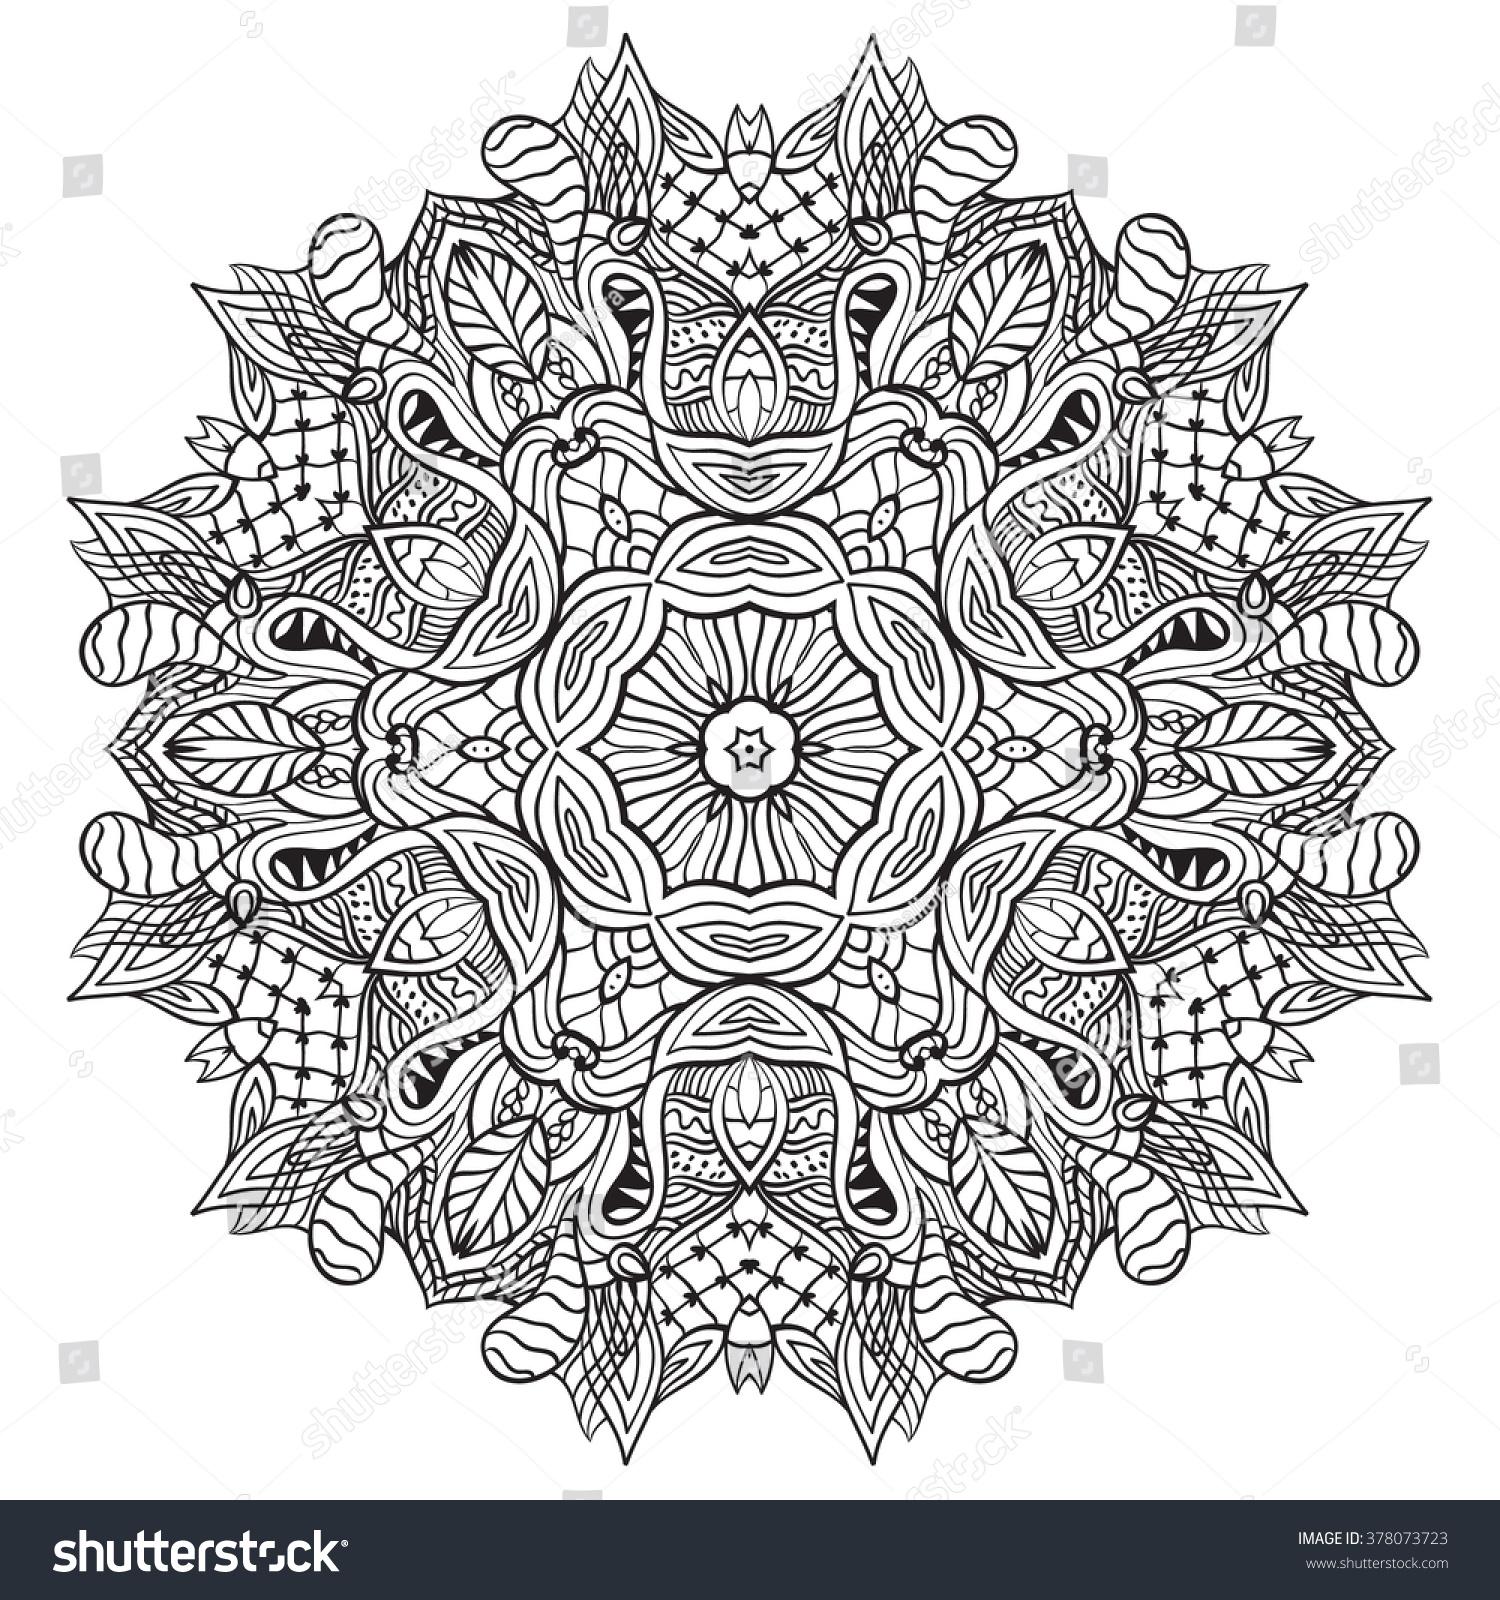 Adult Coloring Page Mandala Vector Art Stock Vector